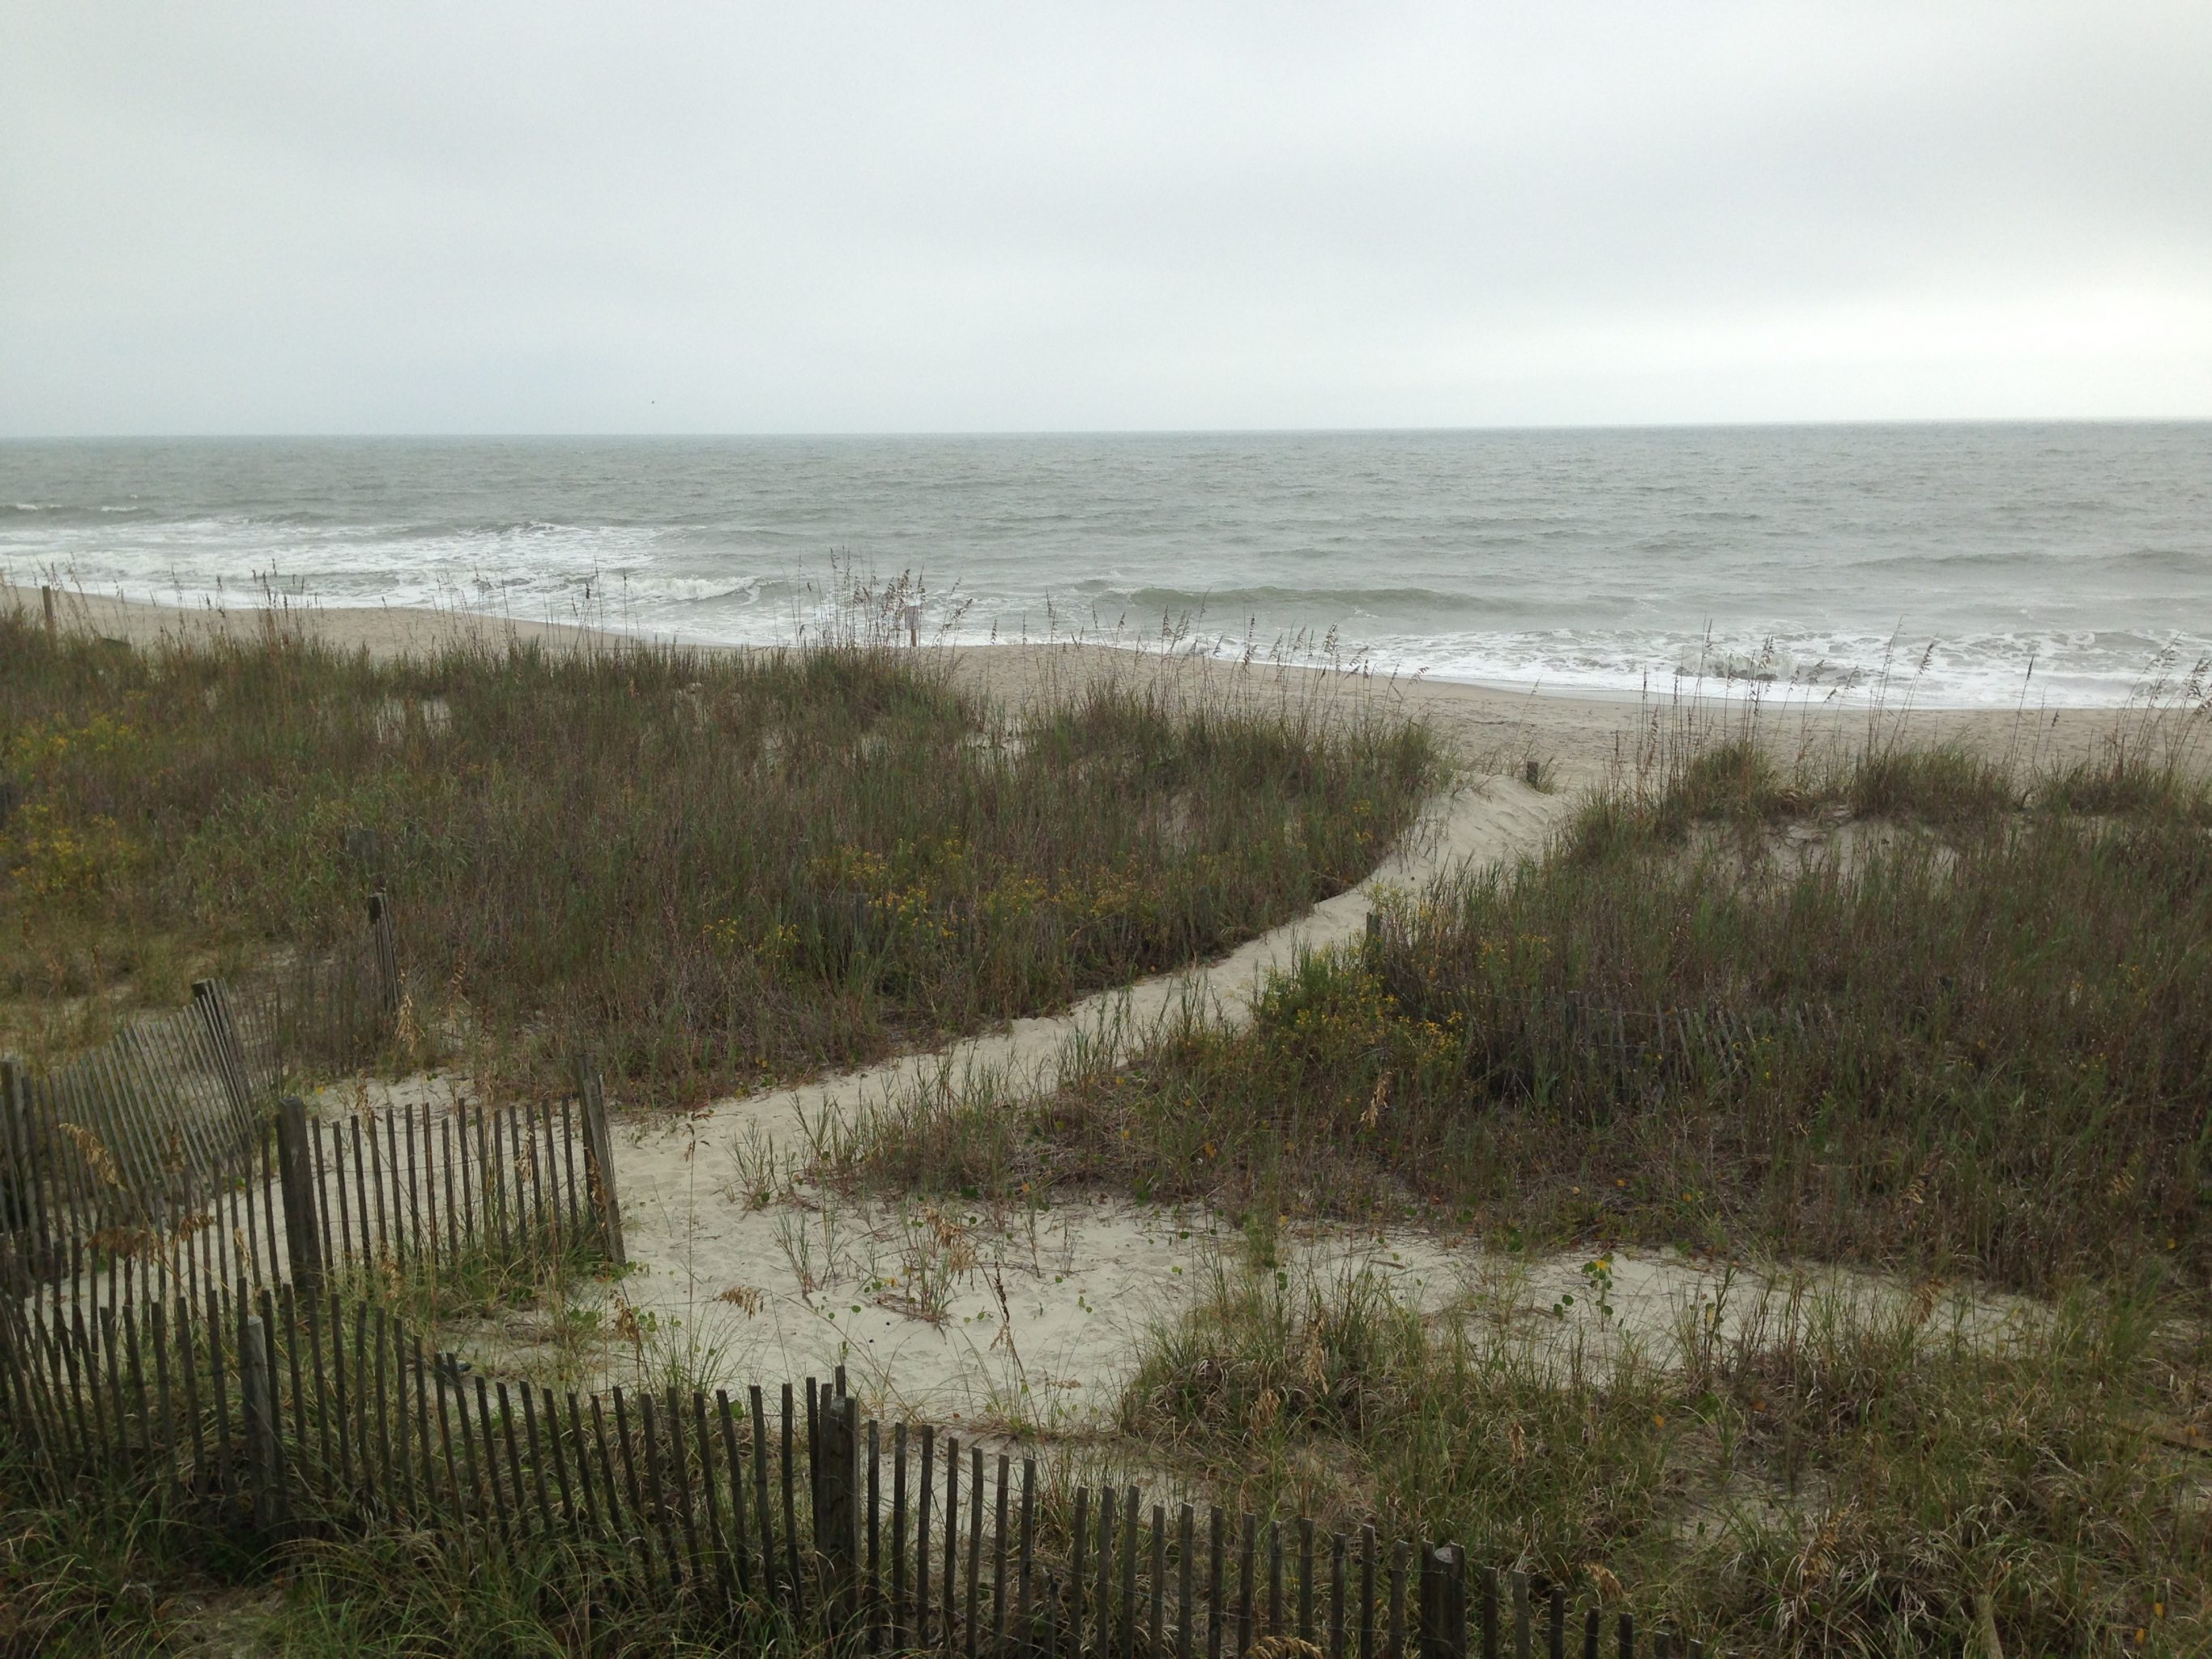 Days 135-136: South Carolina (Part 1)